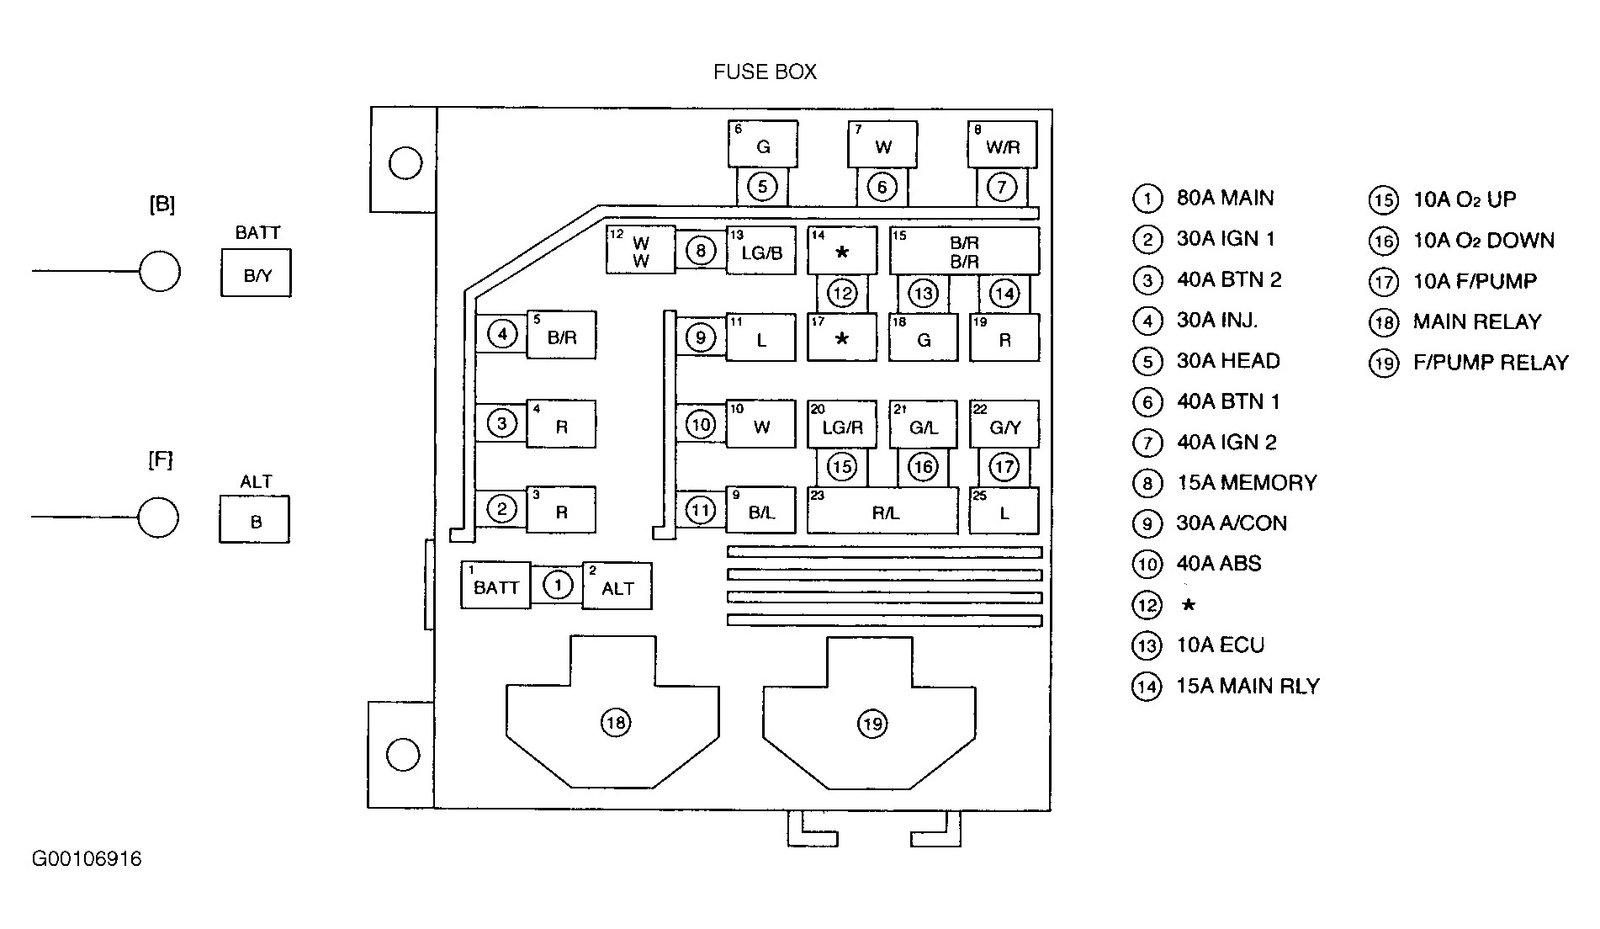 hight resolution of 2001 kia sephia fuse panel diagram wiring diagram b7wrg 8370 2009 kia sportage fuse box